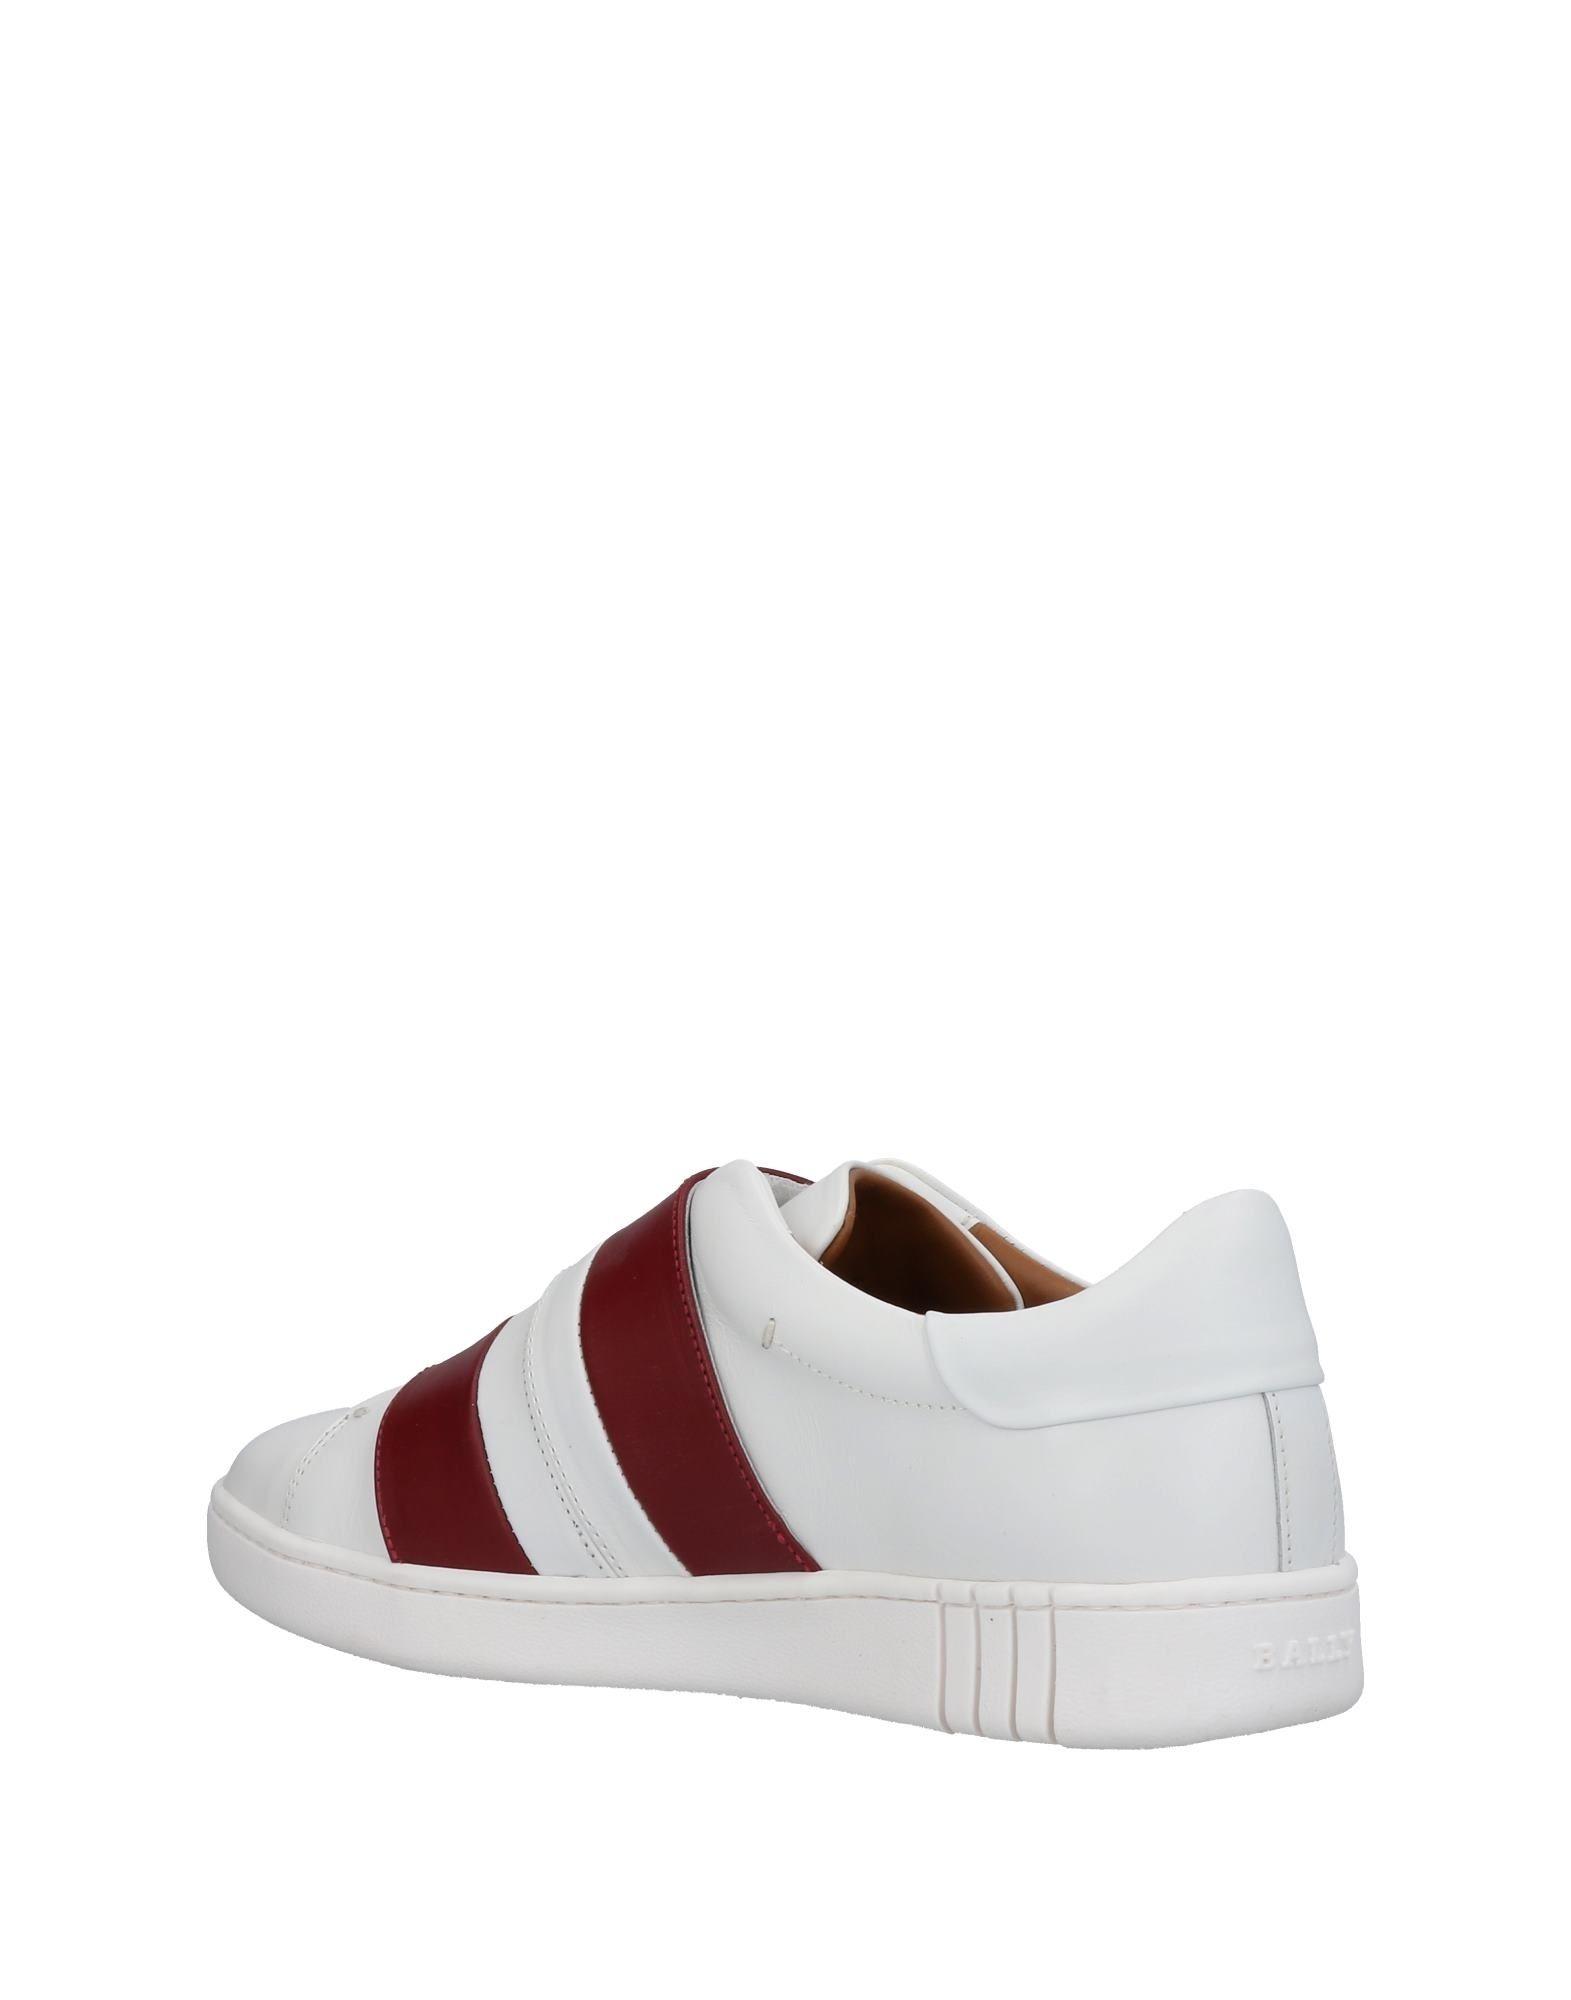 Bally Damen Sneakers Damen Bally  11436340FR Heiße Schuhe e1c0dd